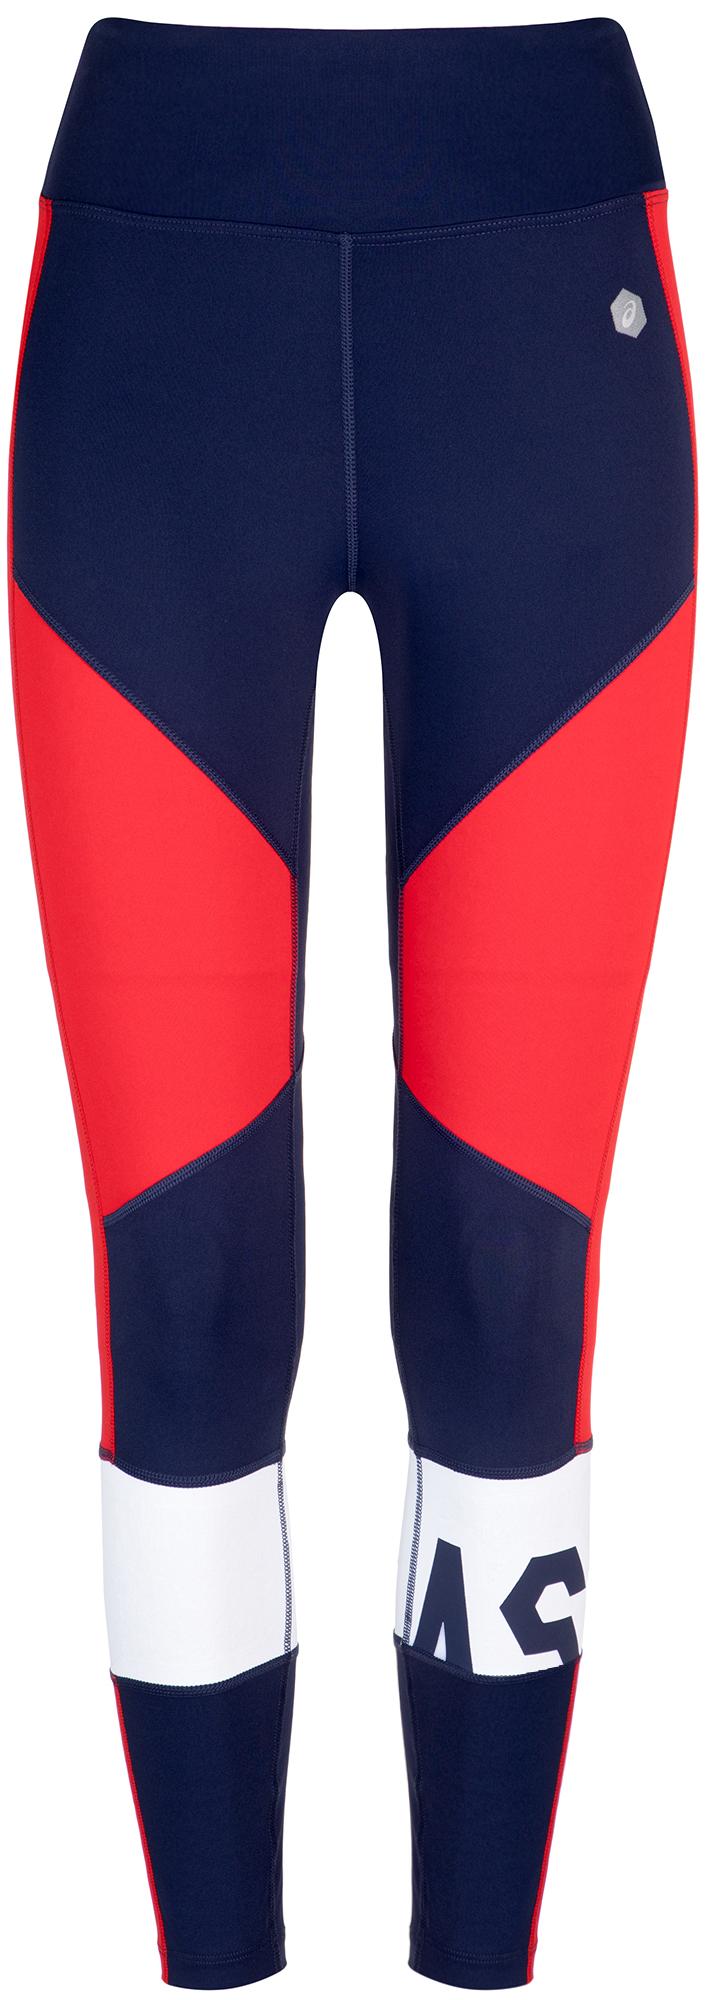 Фото - ASICS Легинсы женские ASICS Color Block, размер 40-42 wide leg pants with color block